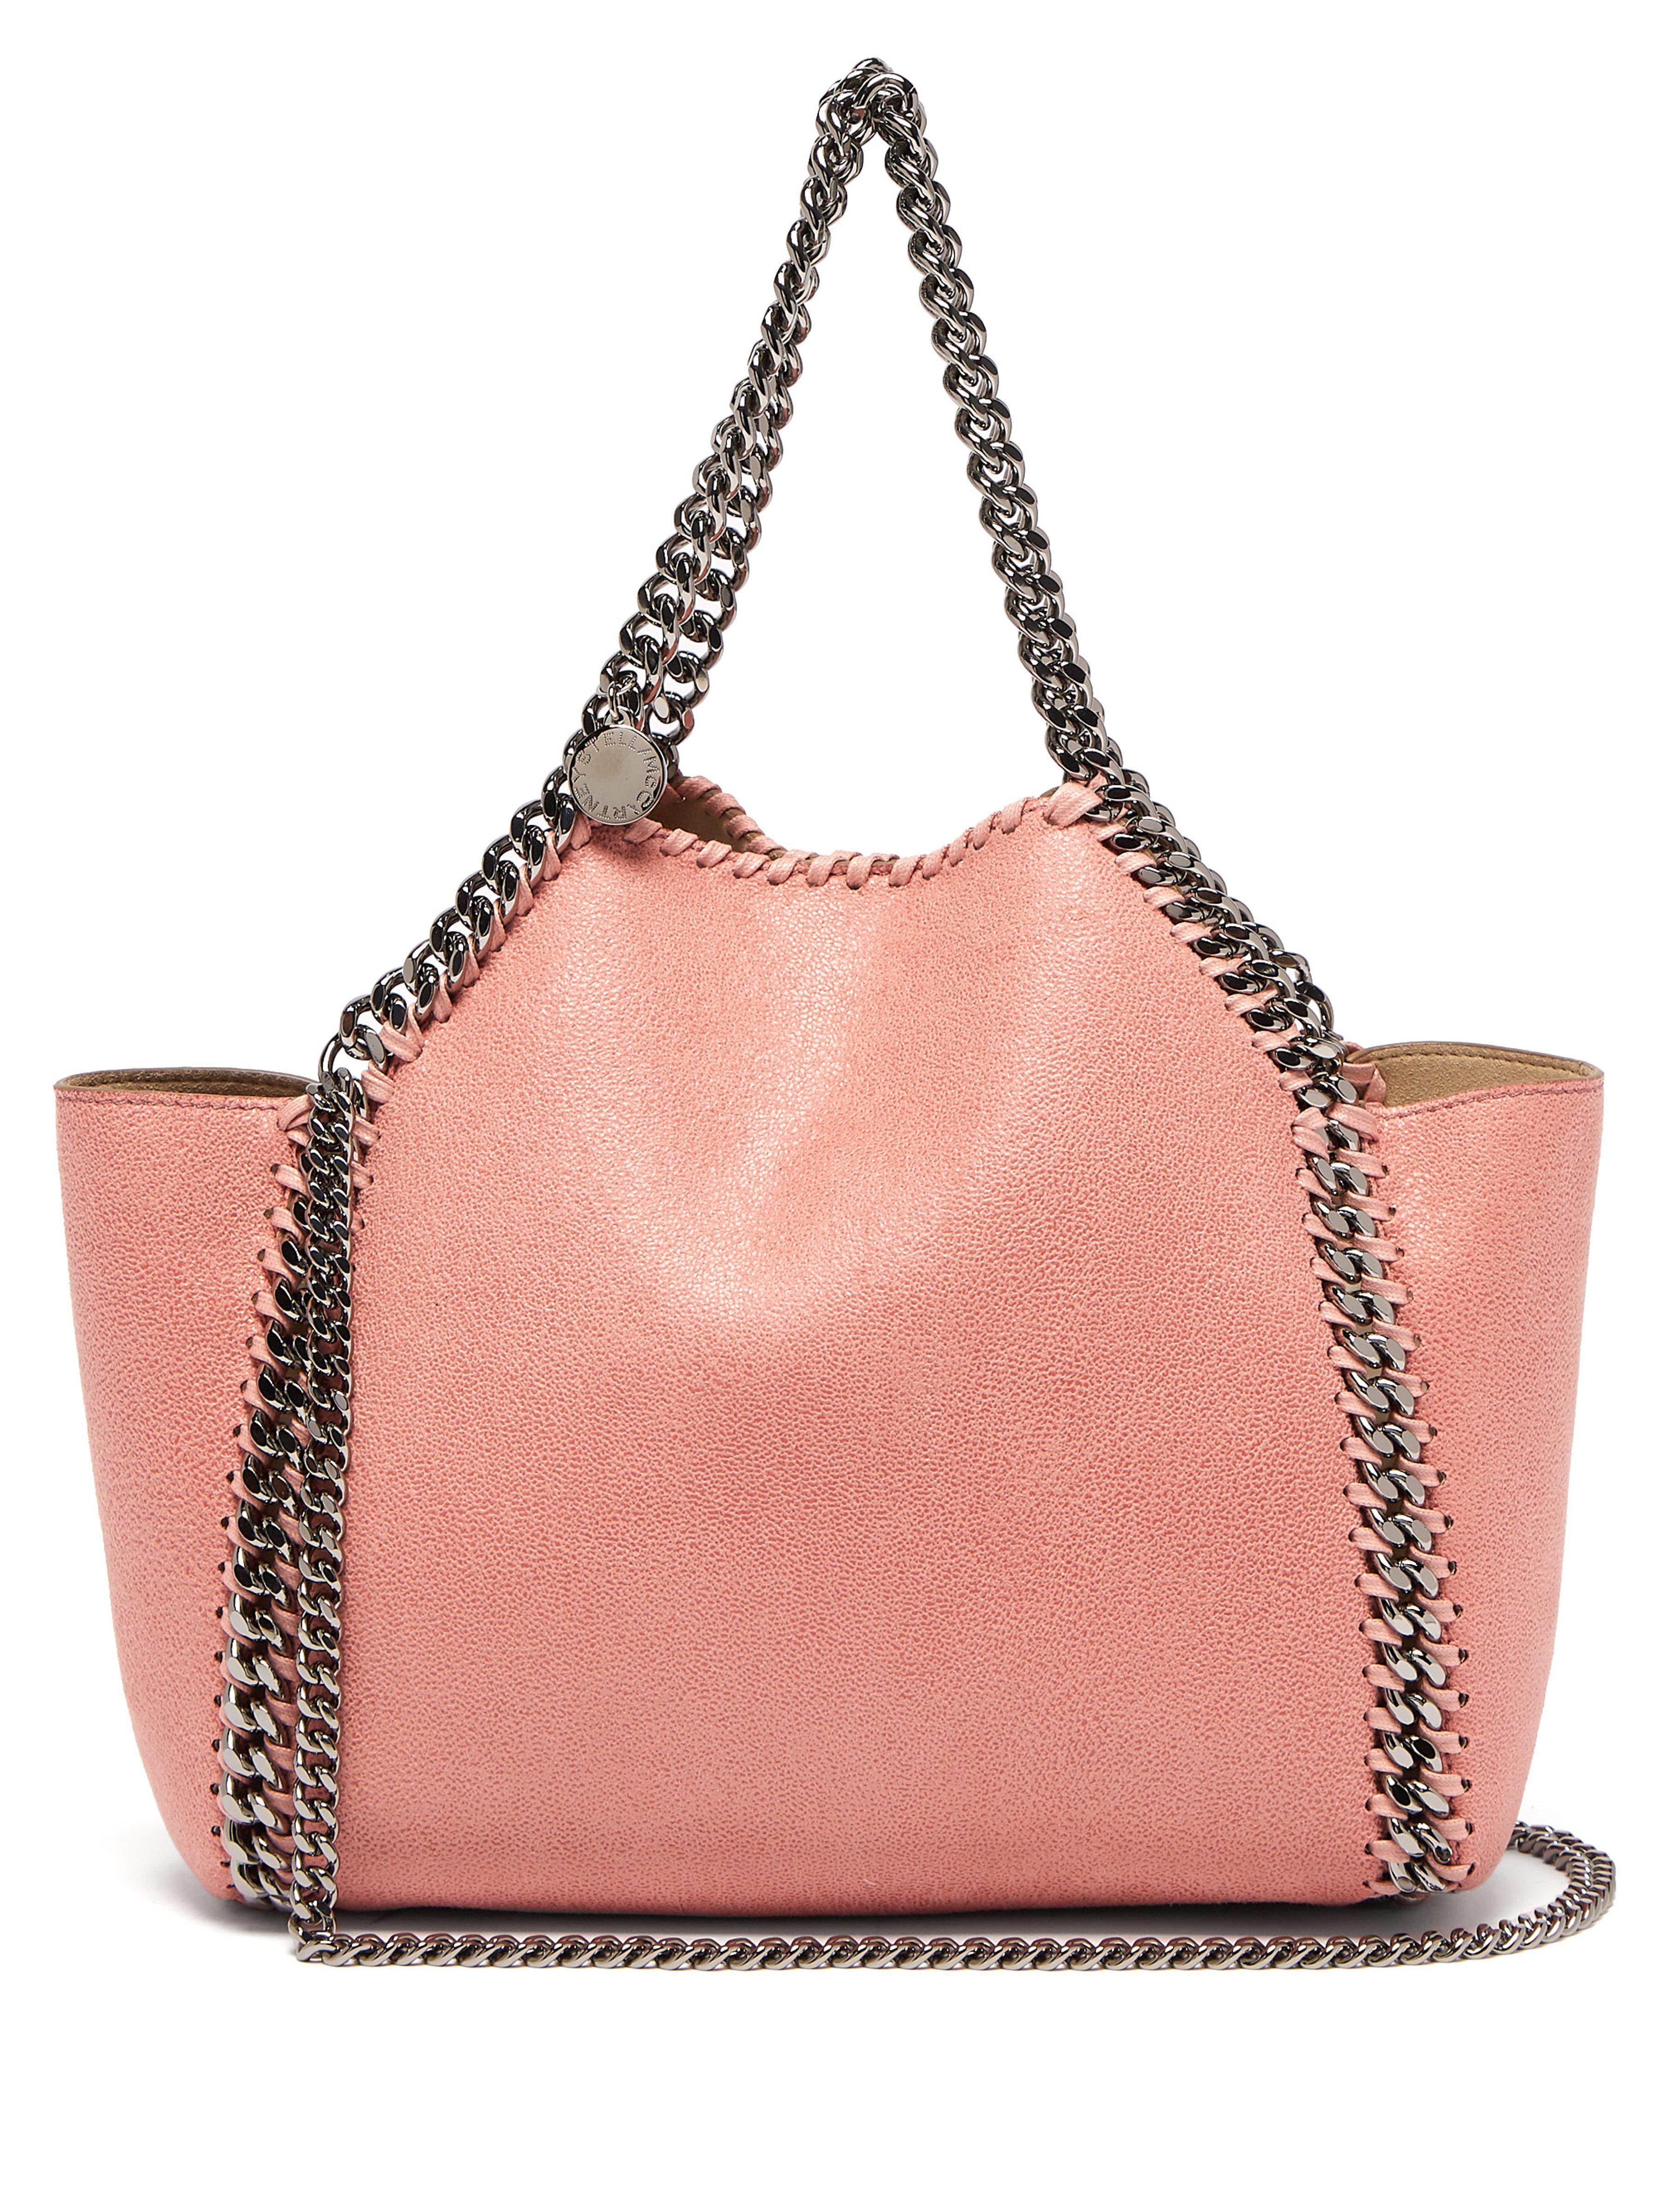 902c46db5178 Stella McCartney. Women s Pink Falabella Mini Faux Suede Reversible Tote Bag